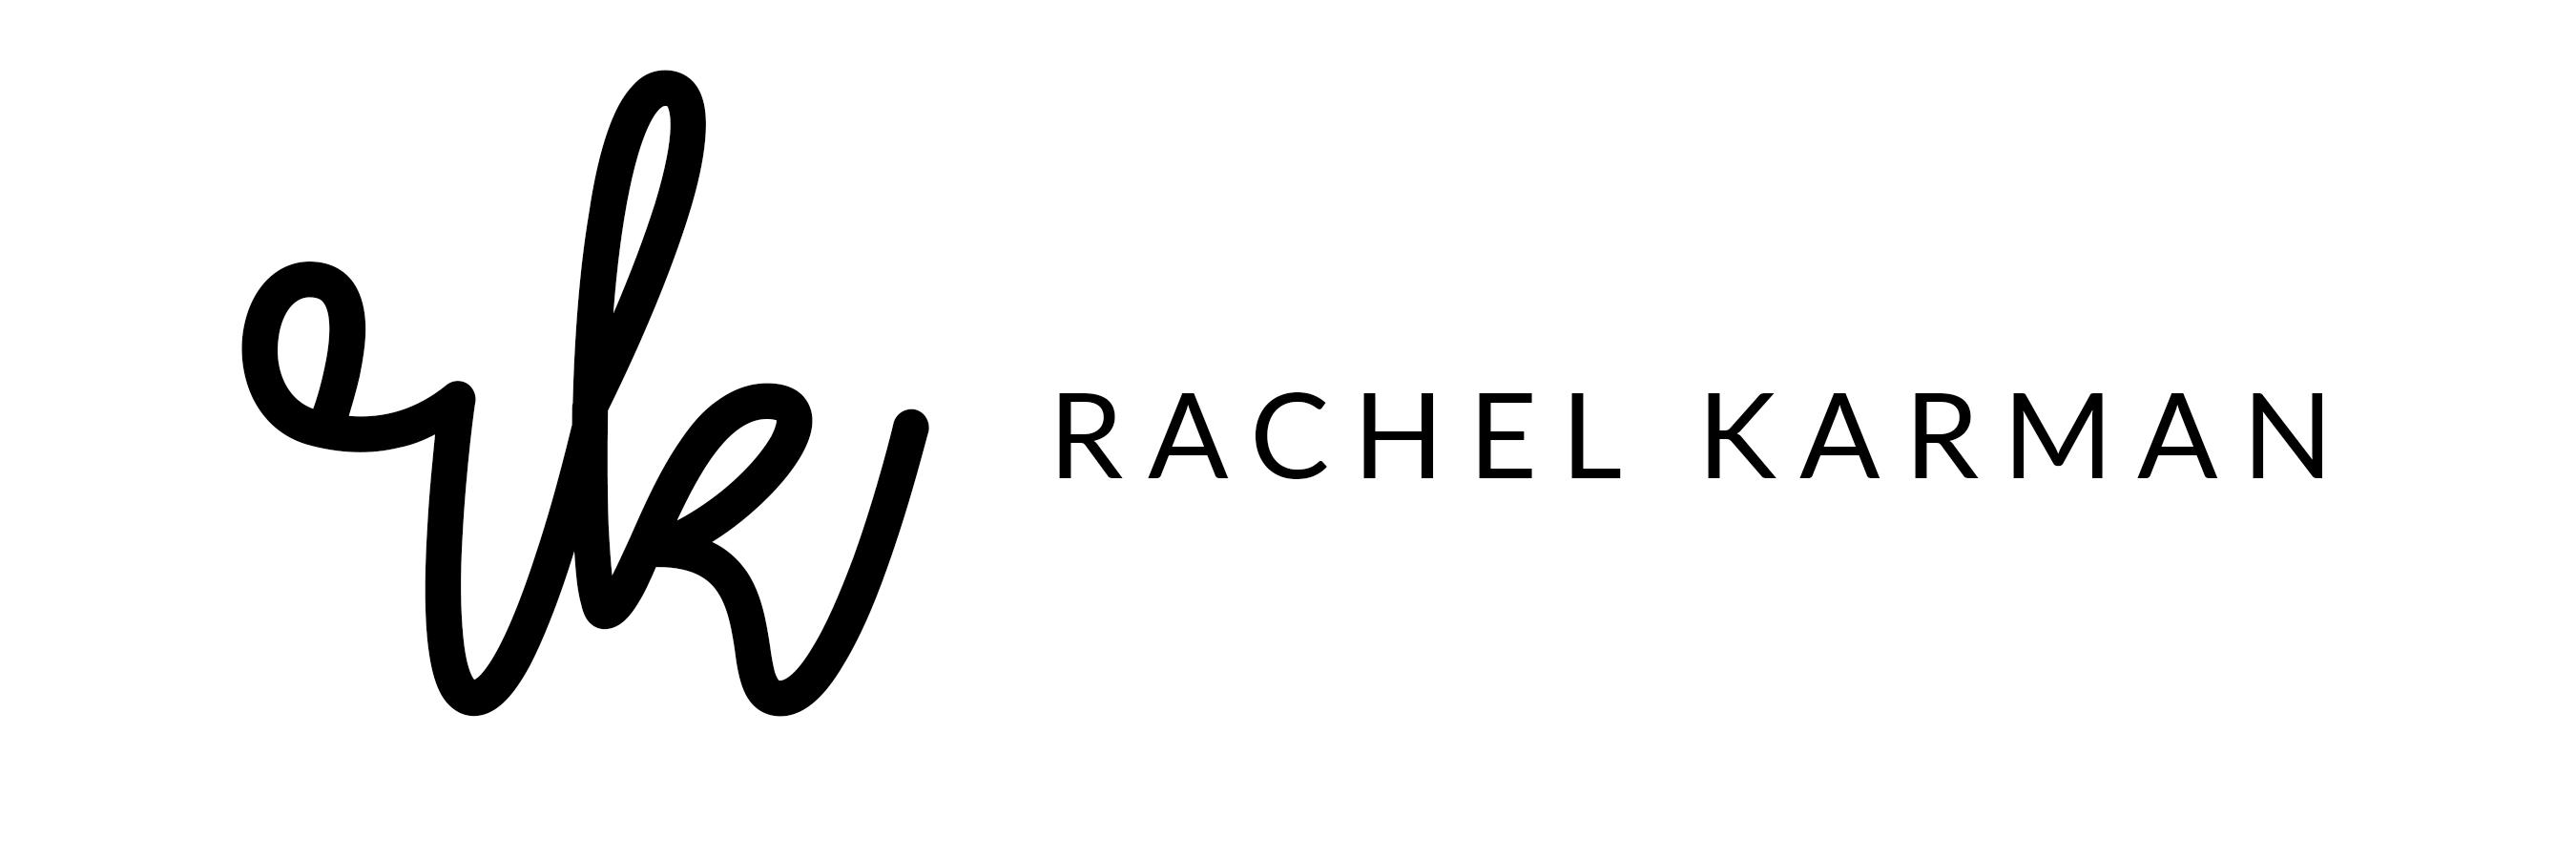 Rachel Karman